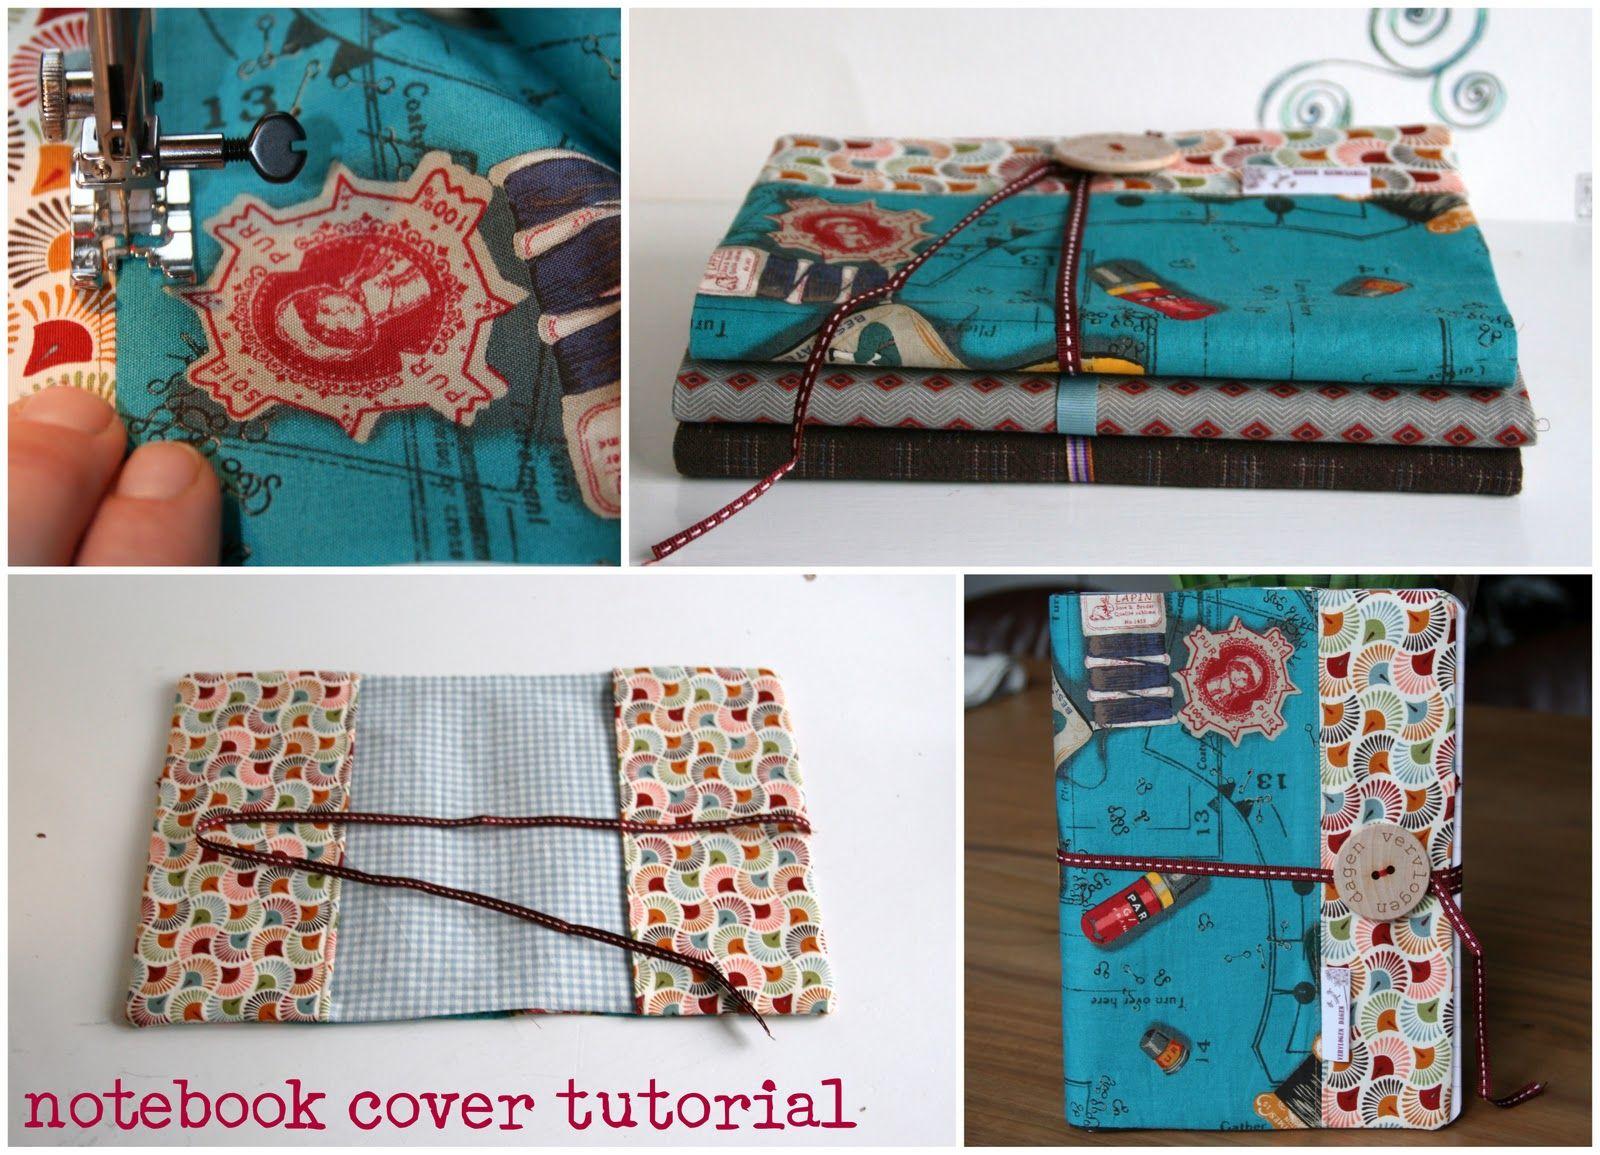 vervlogendagentutorials Fabric covered notebook Tutorial